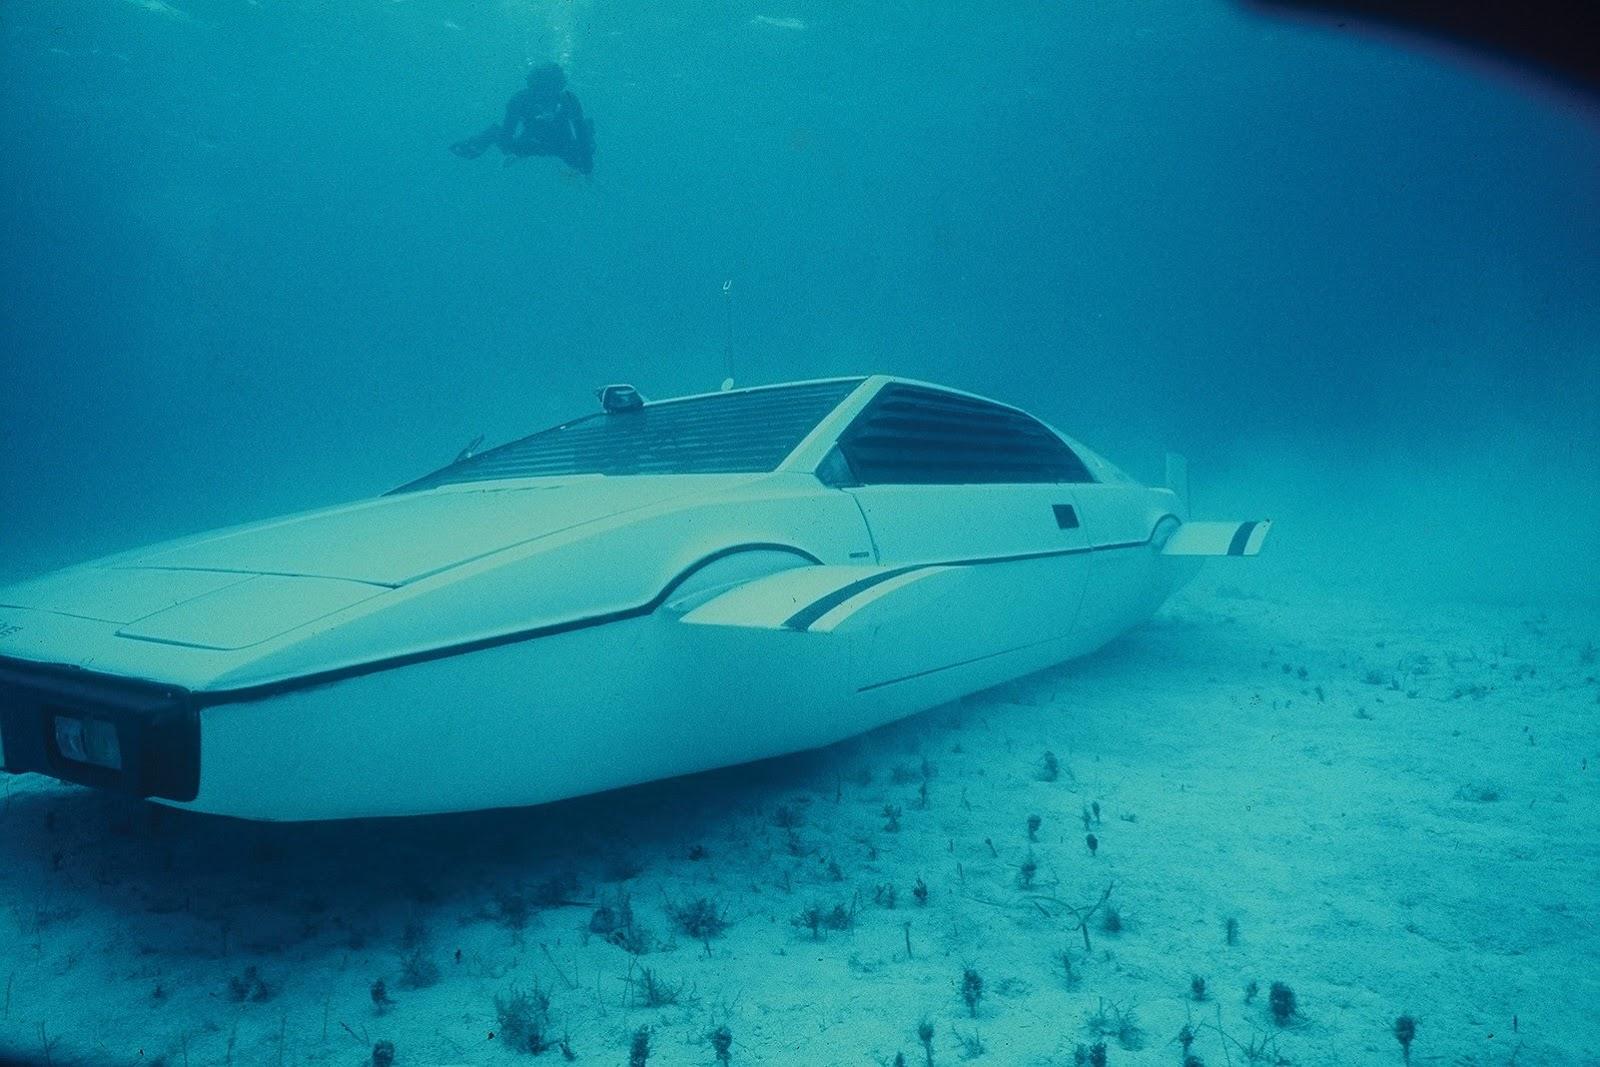 1977-lotus-esprit-submarine-james-bond-11